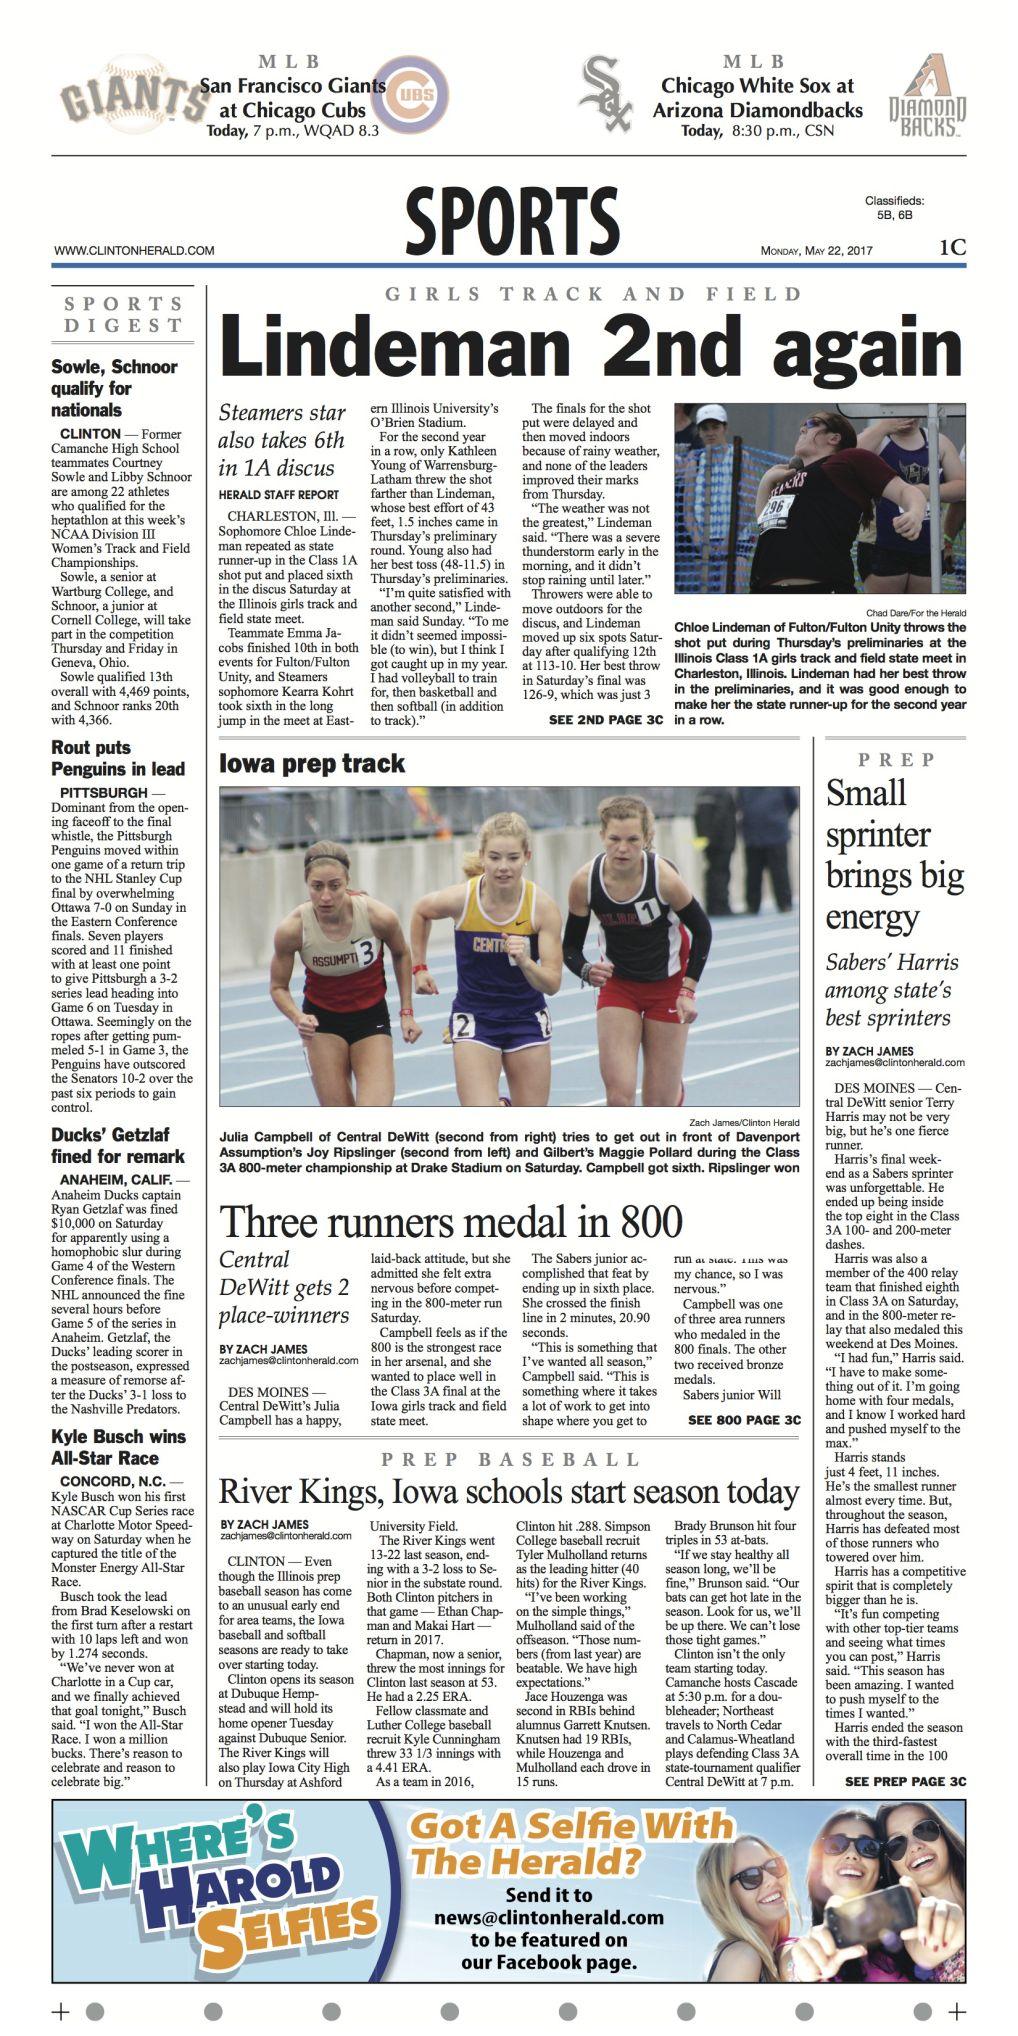 Iowa prep track: Three runners medal in 800 | Sports